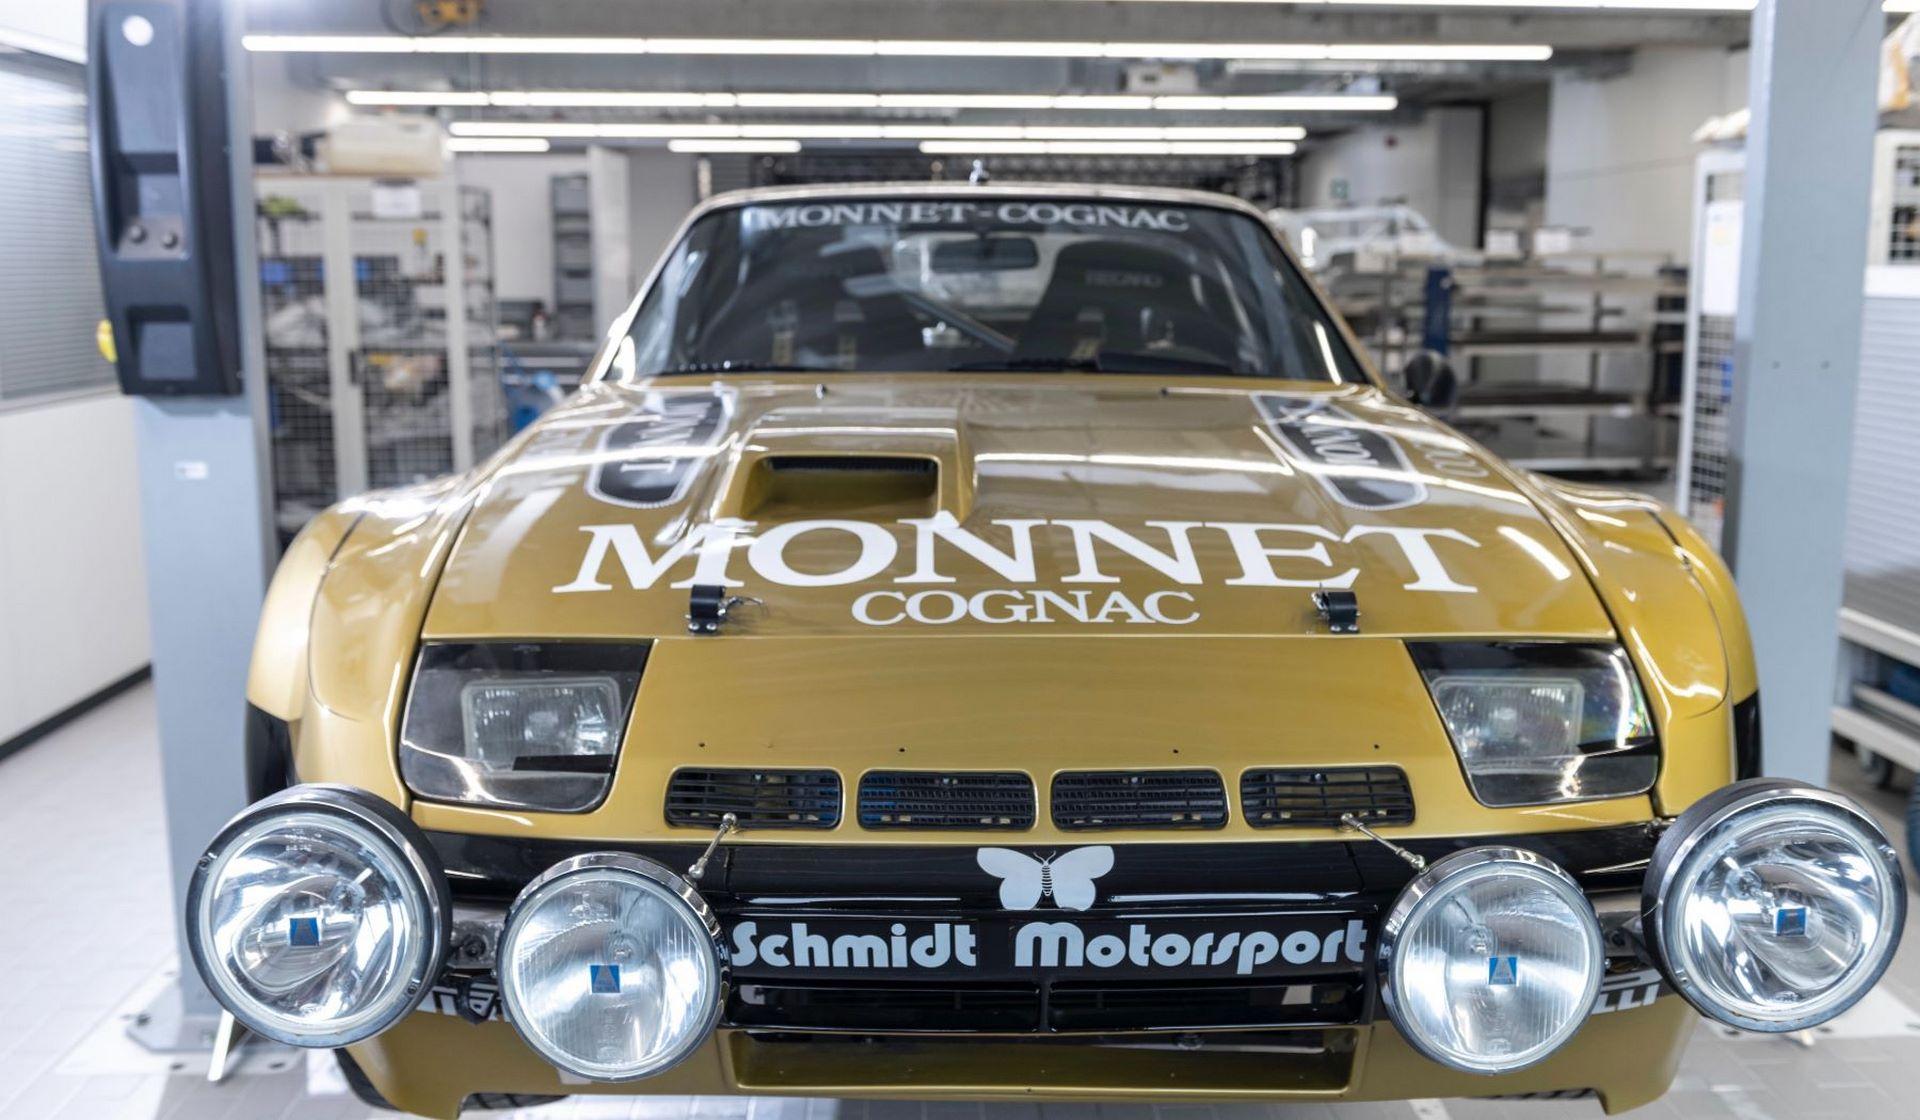 Porsche-924-Carrera-GTS-rally-car-Walter-Rohrl-26